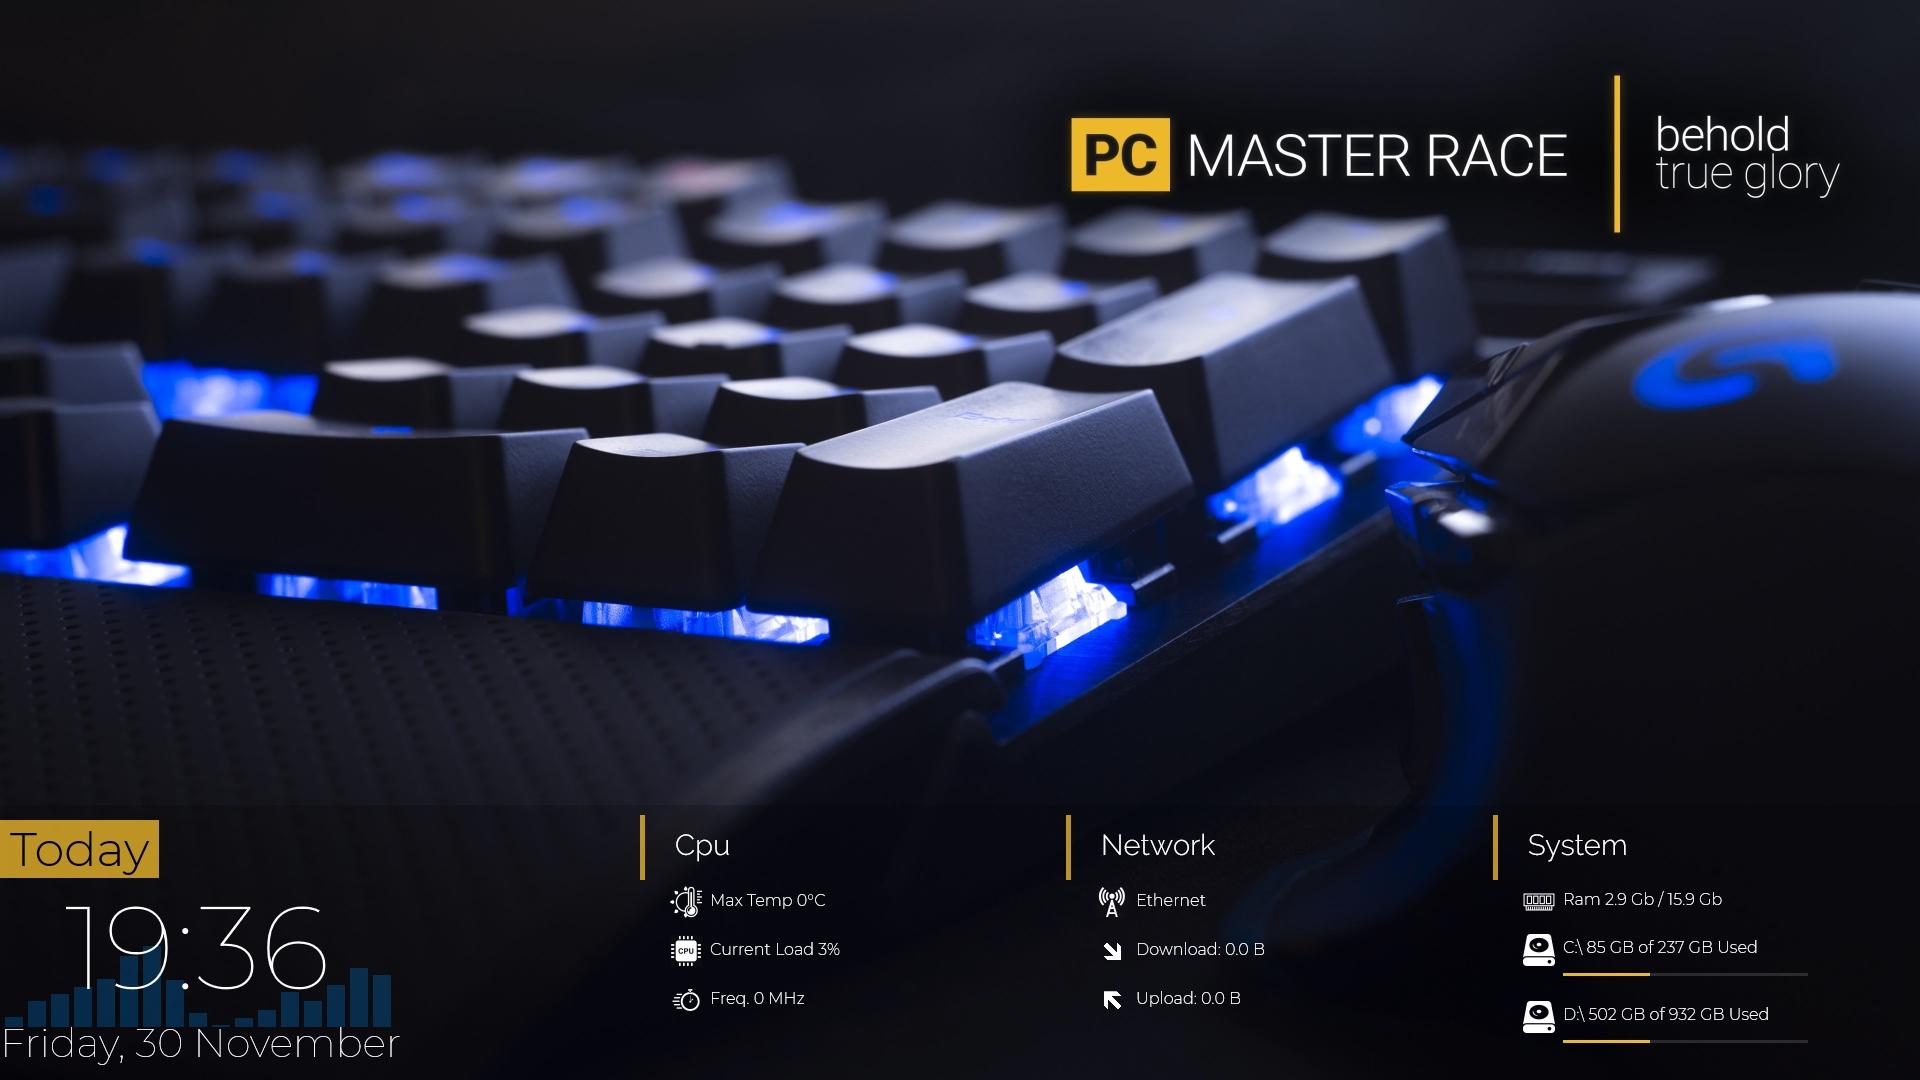 Pc Master Race 1 1 By Ninjaki8 On Deviantart